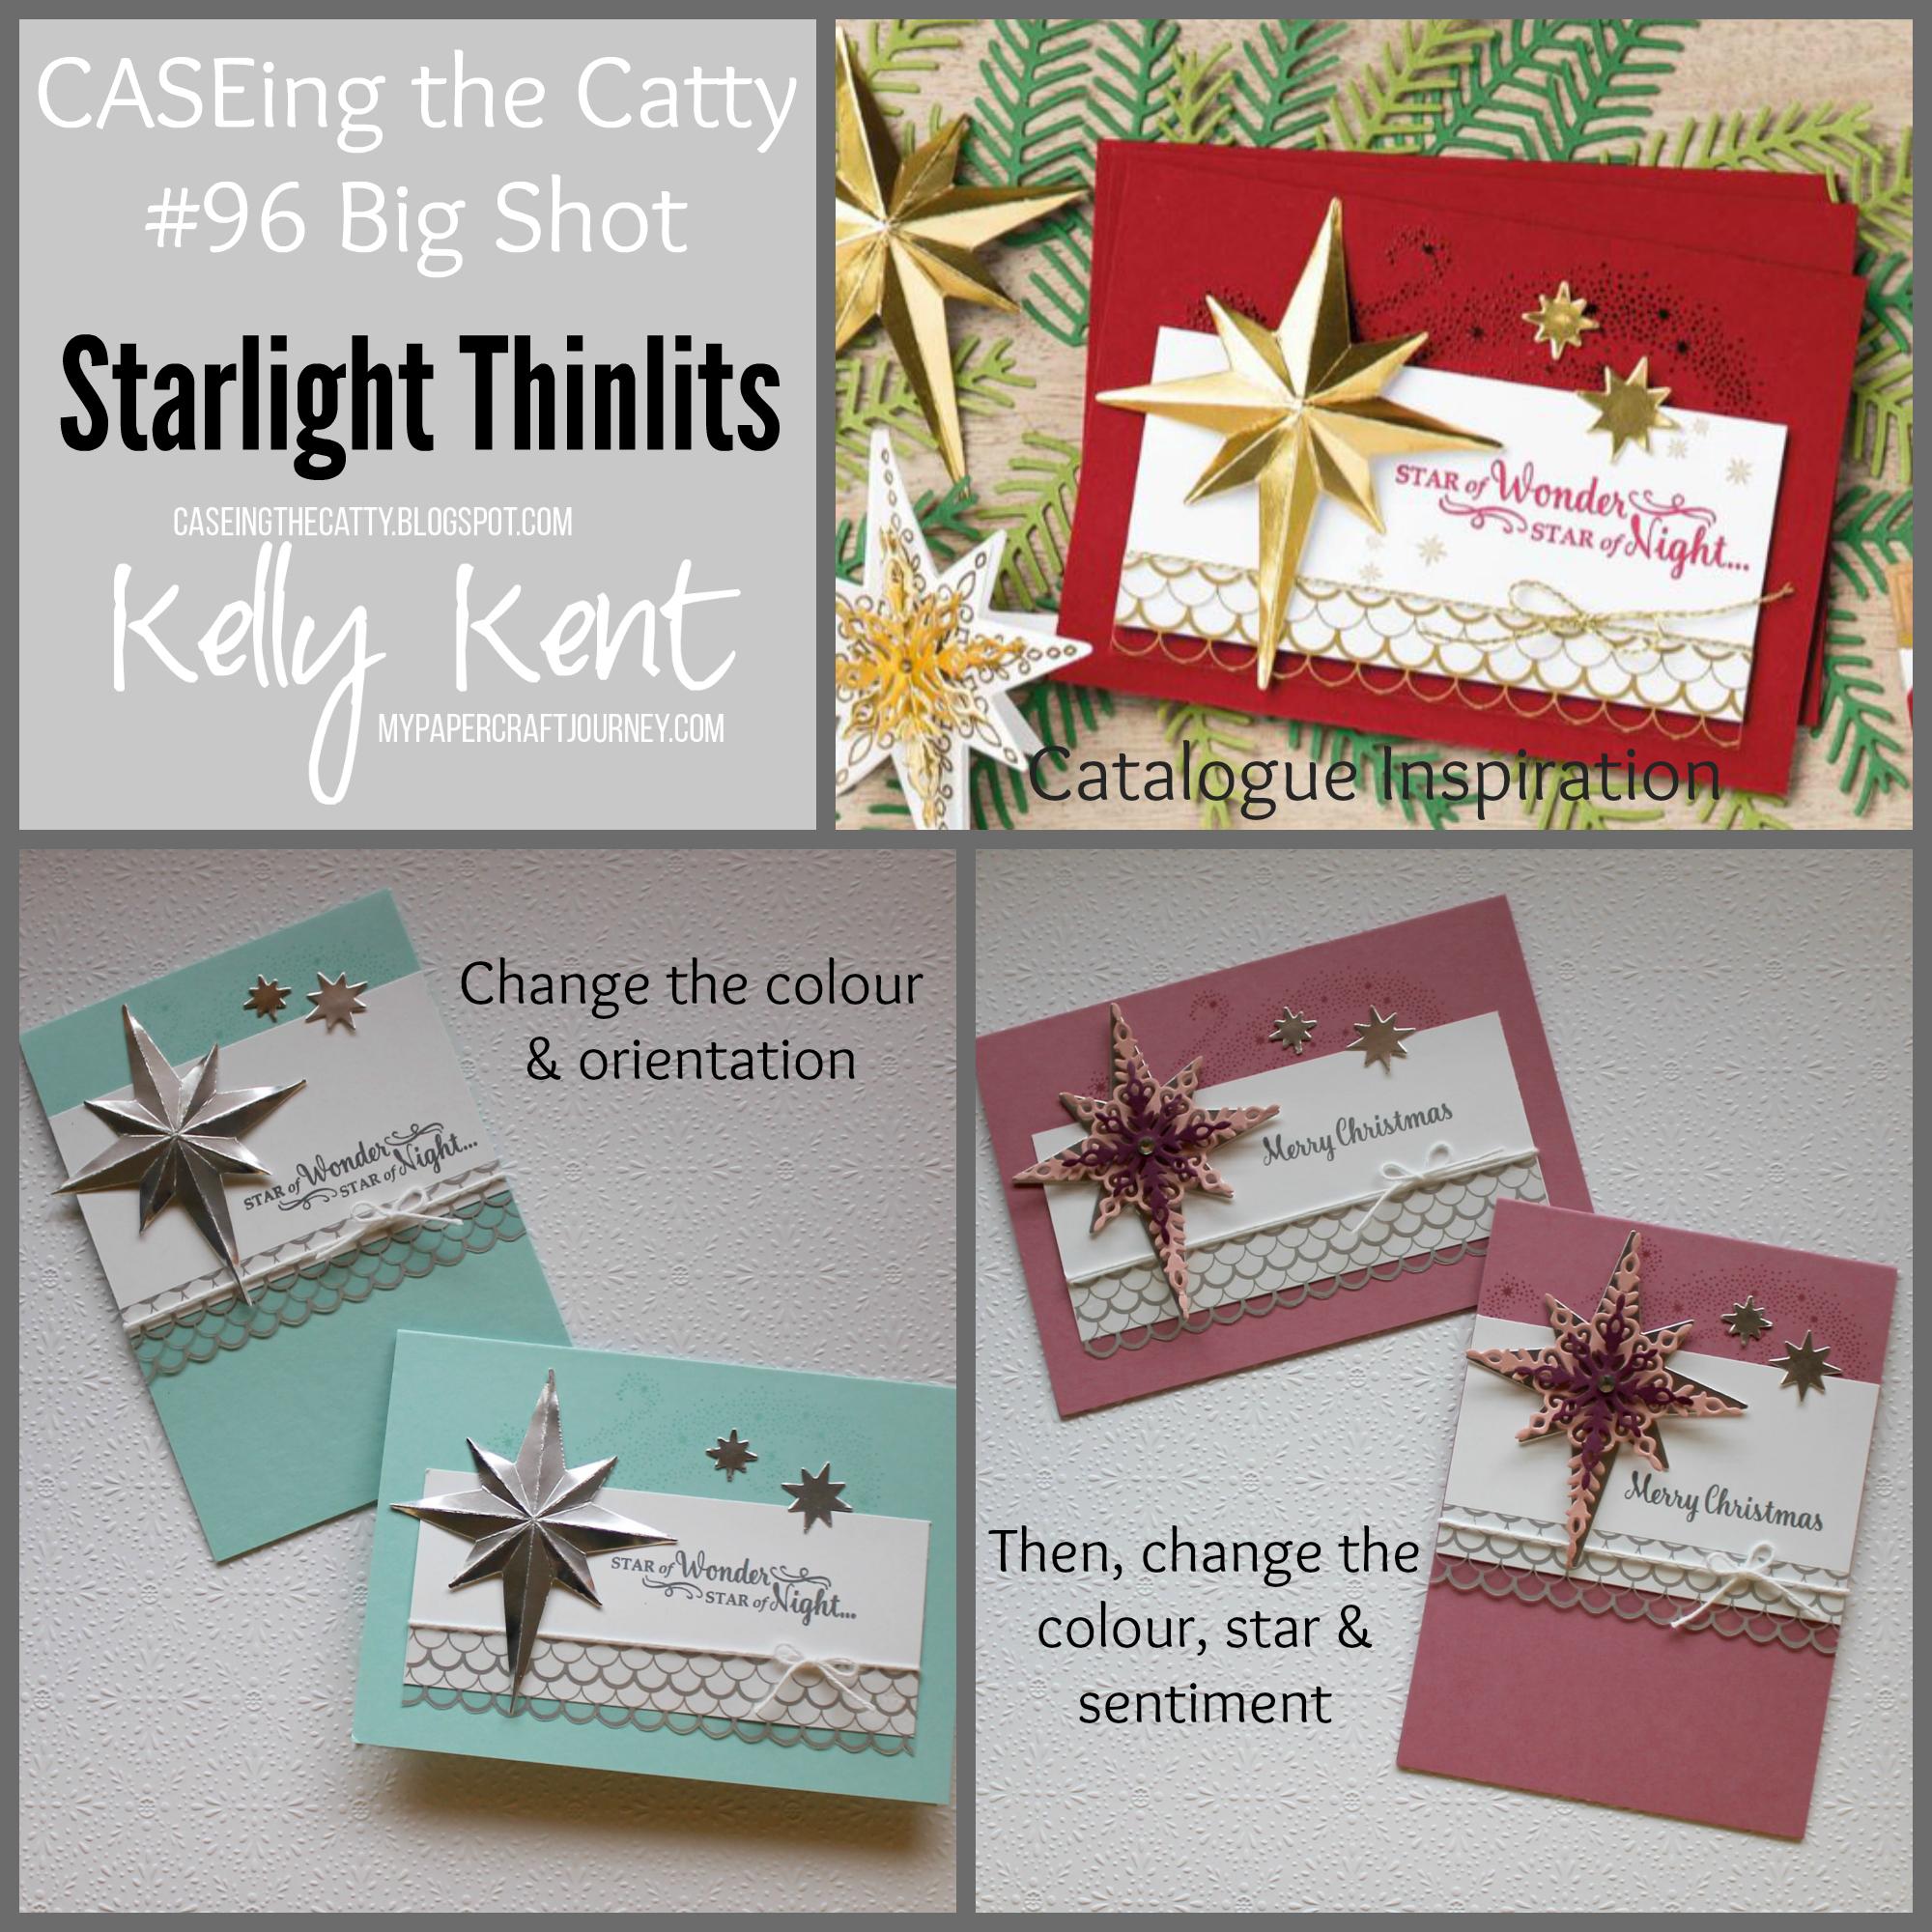 CASEing the Catty #96 - Big Shot. Starlight Thinlits & Star of Light stamp set. Kelly Kent - mypapercraftjourney.com.